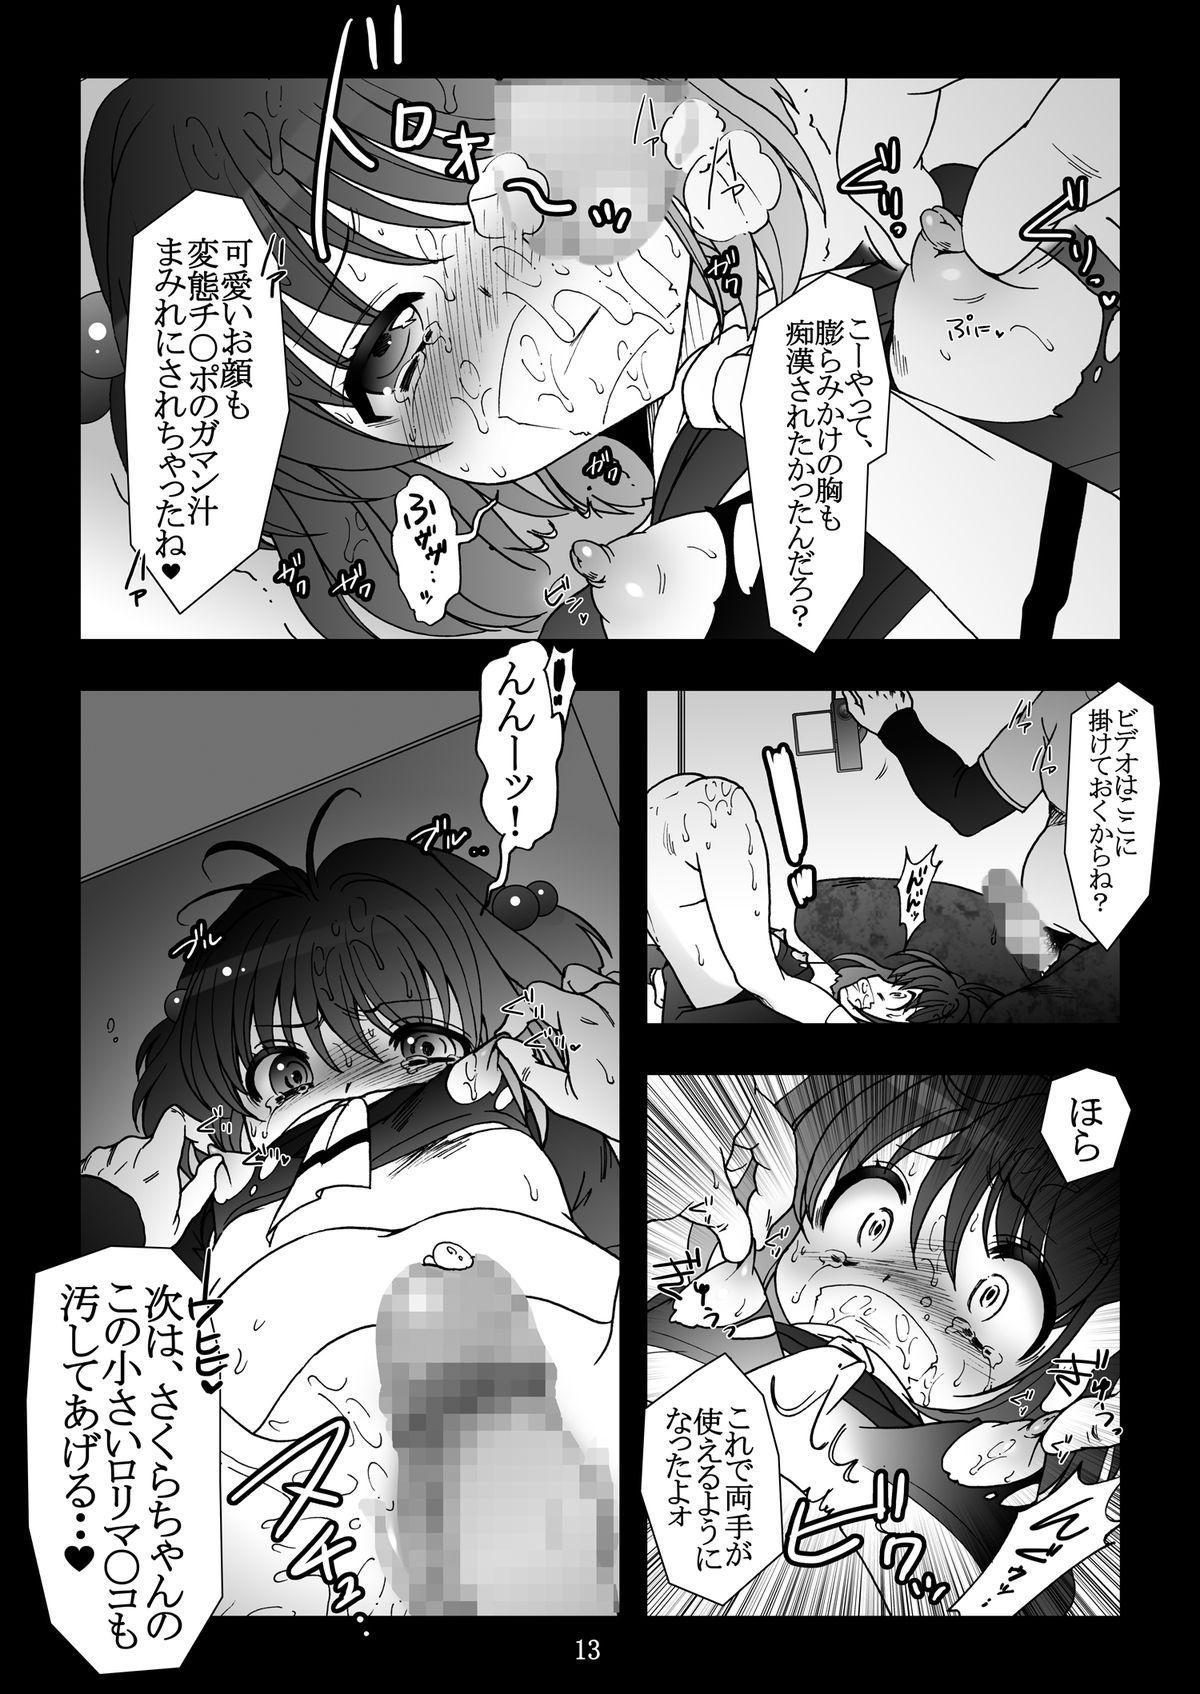 Sakura Slave to the Grind 12